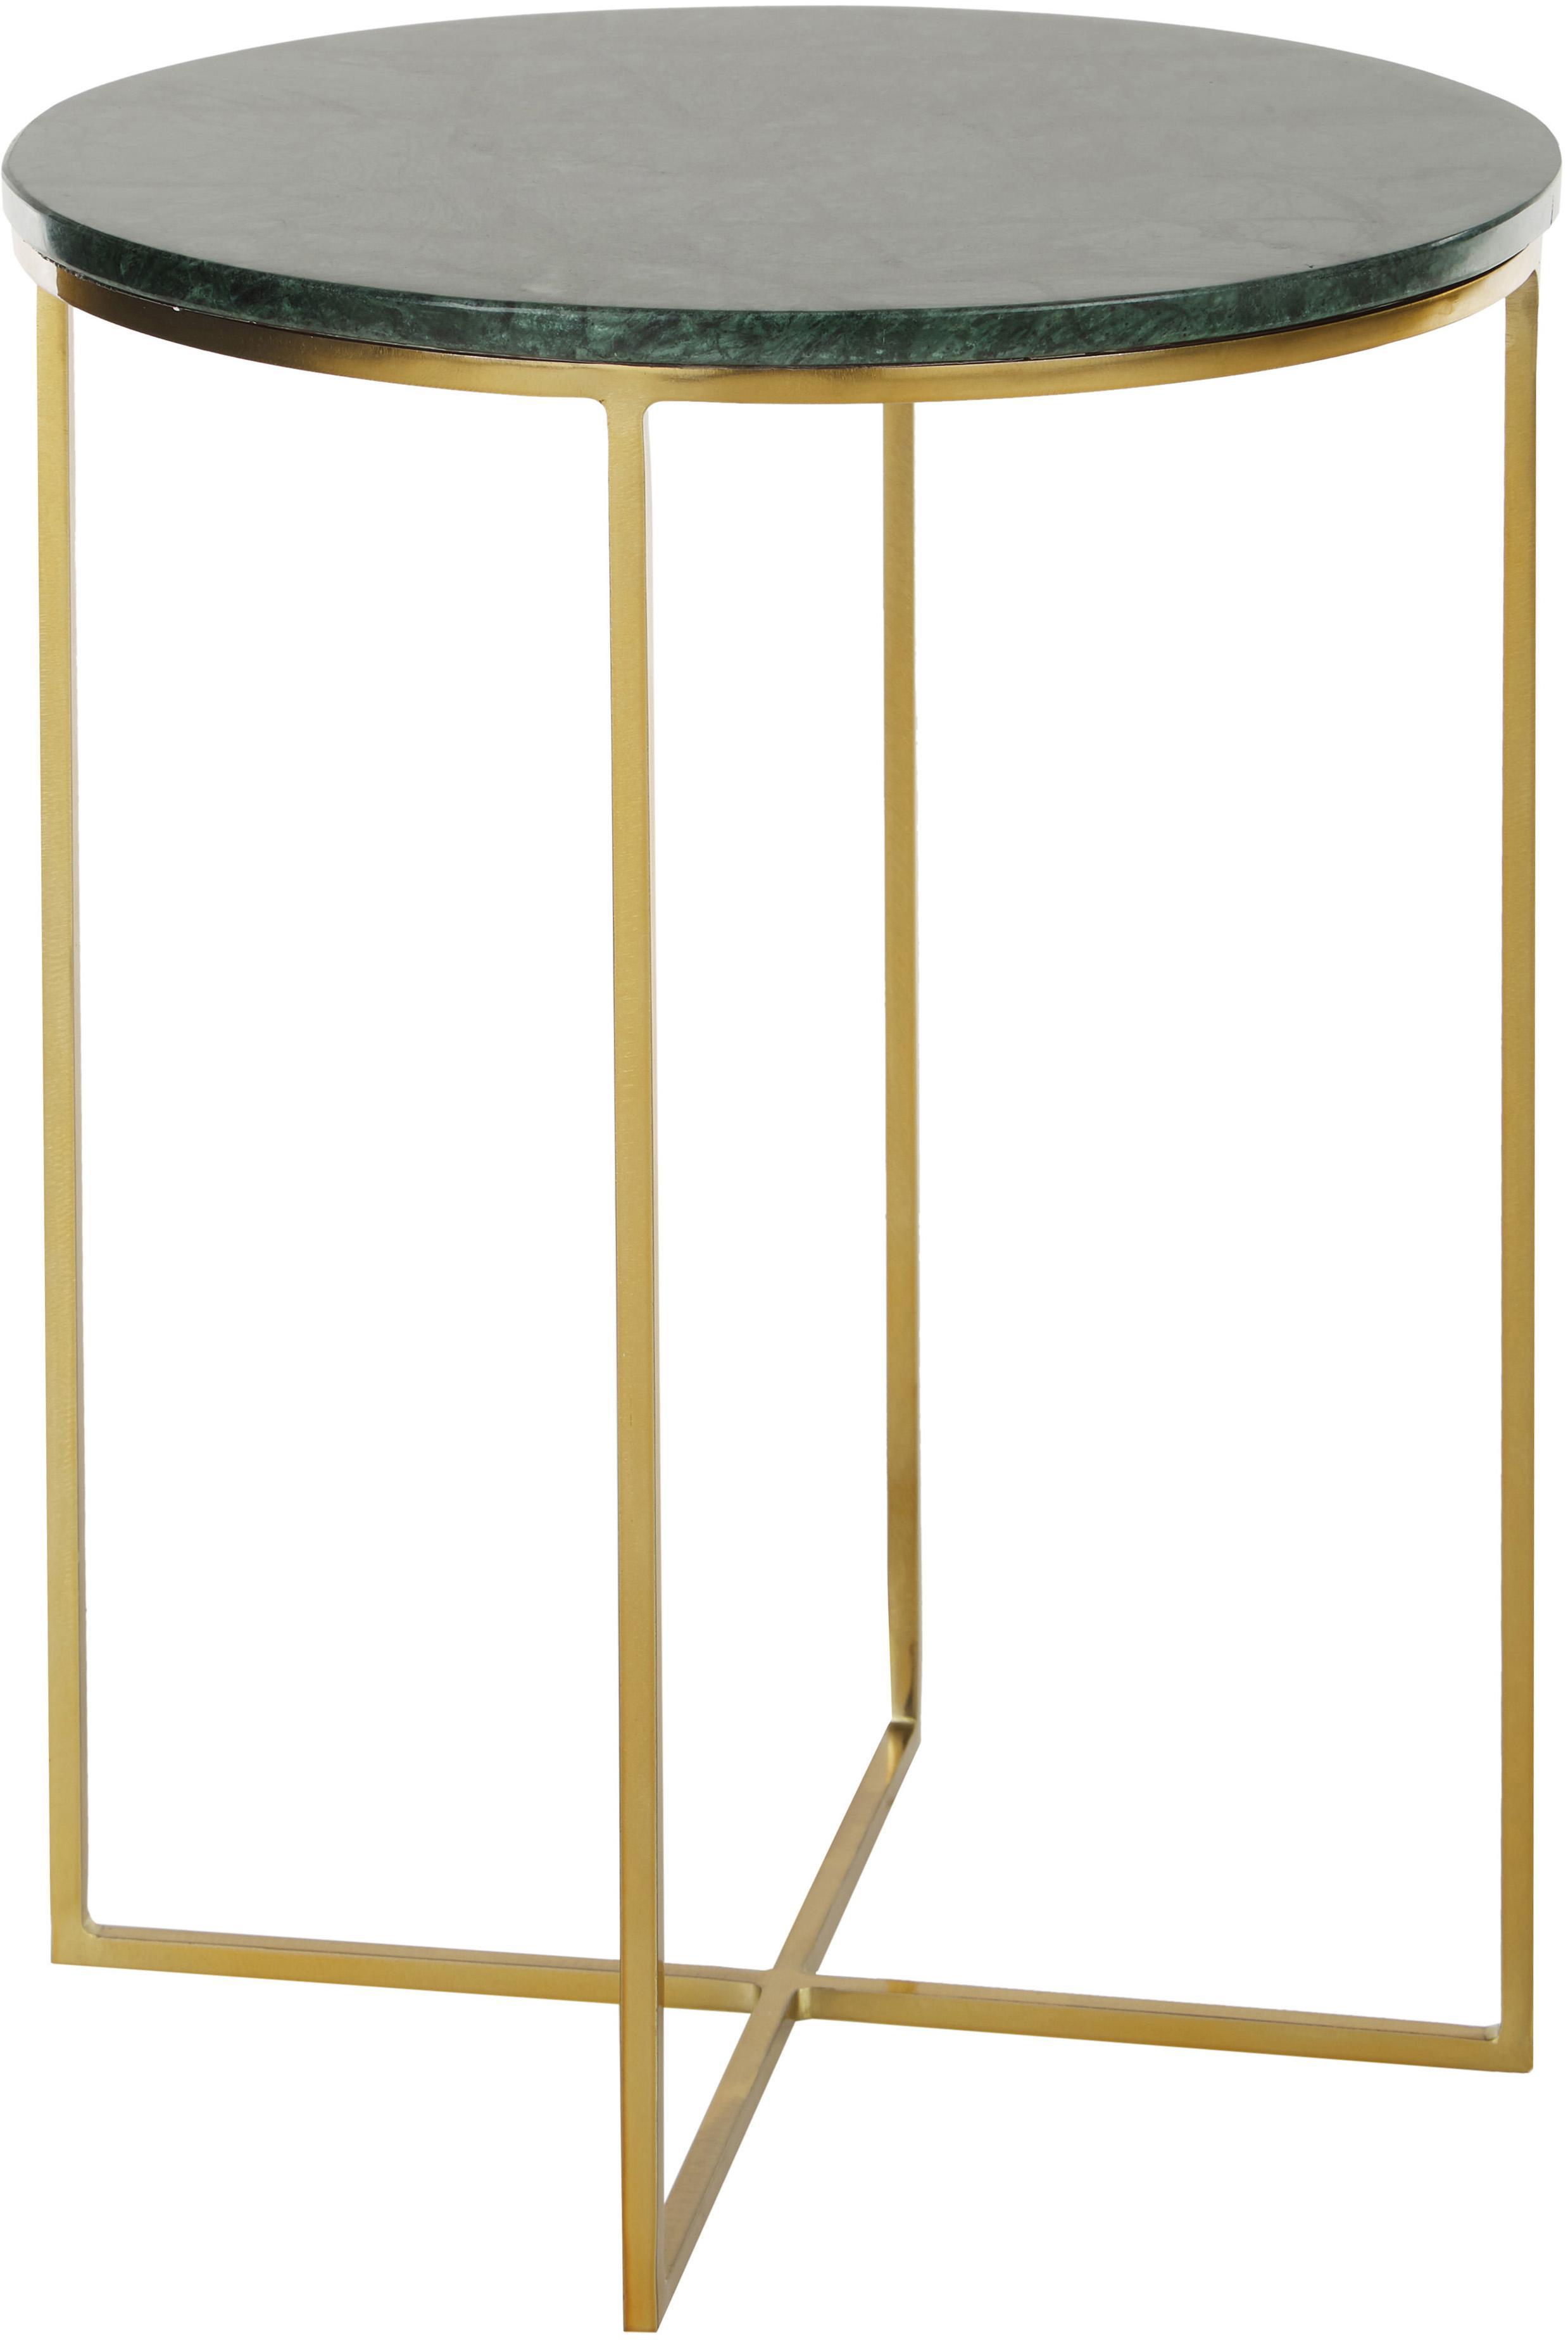 Ronde marmeren bijzettafel Alys, Tafelblad: marmer, Frame: gecoat metaal, Tafelblad: groen marmer. Frame: goudkleurig, glanzend, Ø 40 x H 50 cm